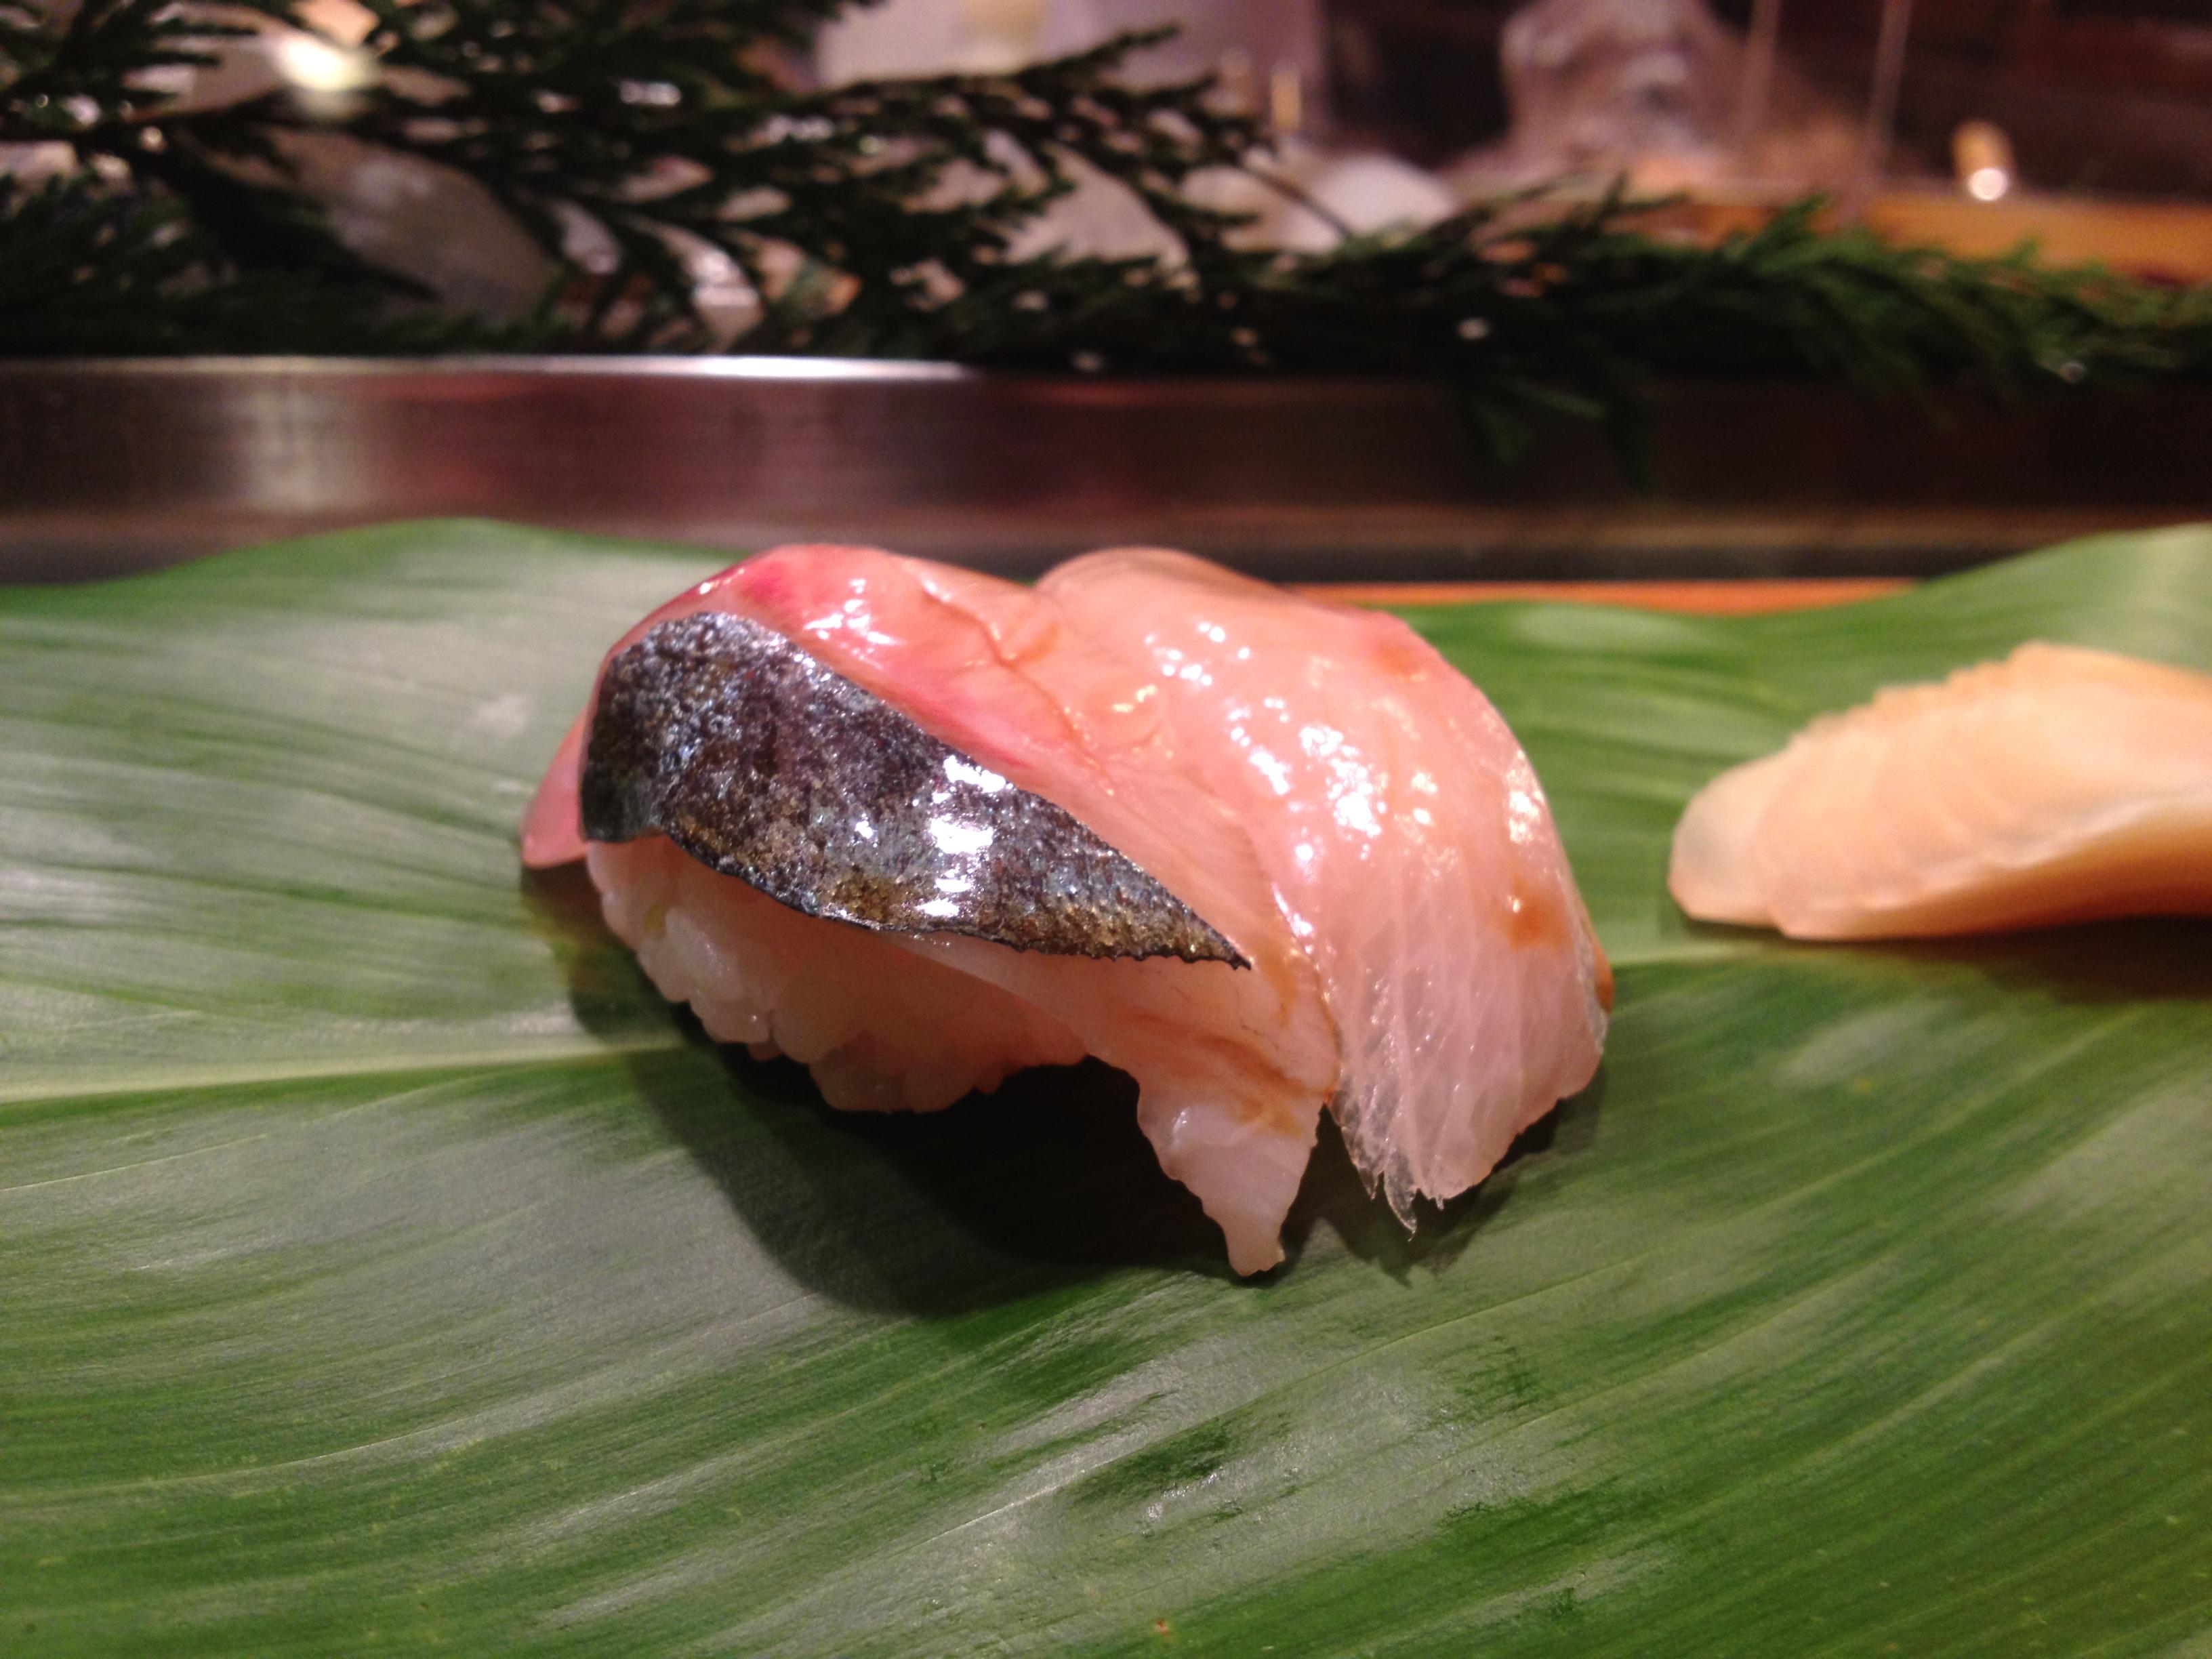 Yellowtail Belly Sushi NYC Sushi: Hatsuhana (...